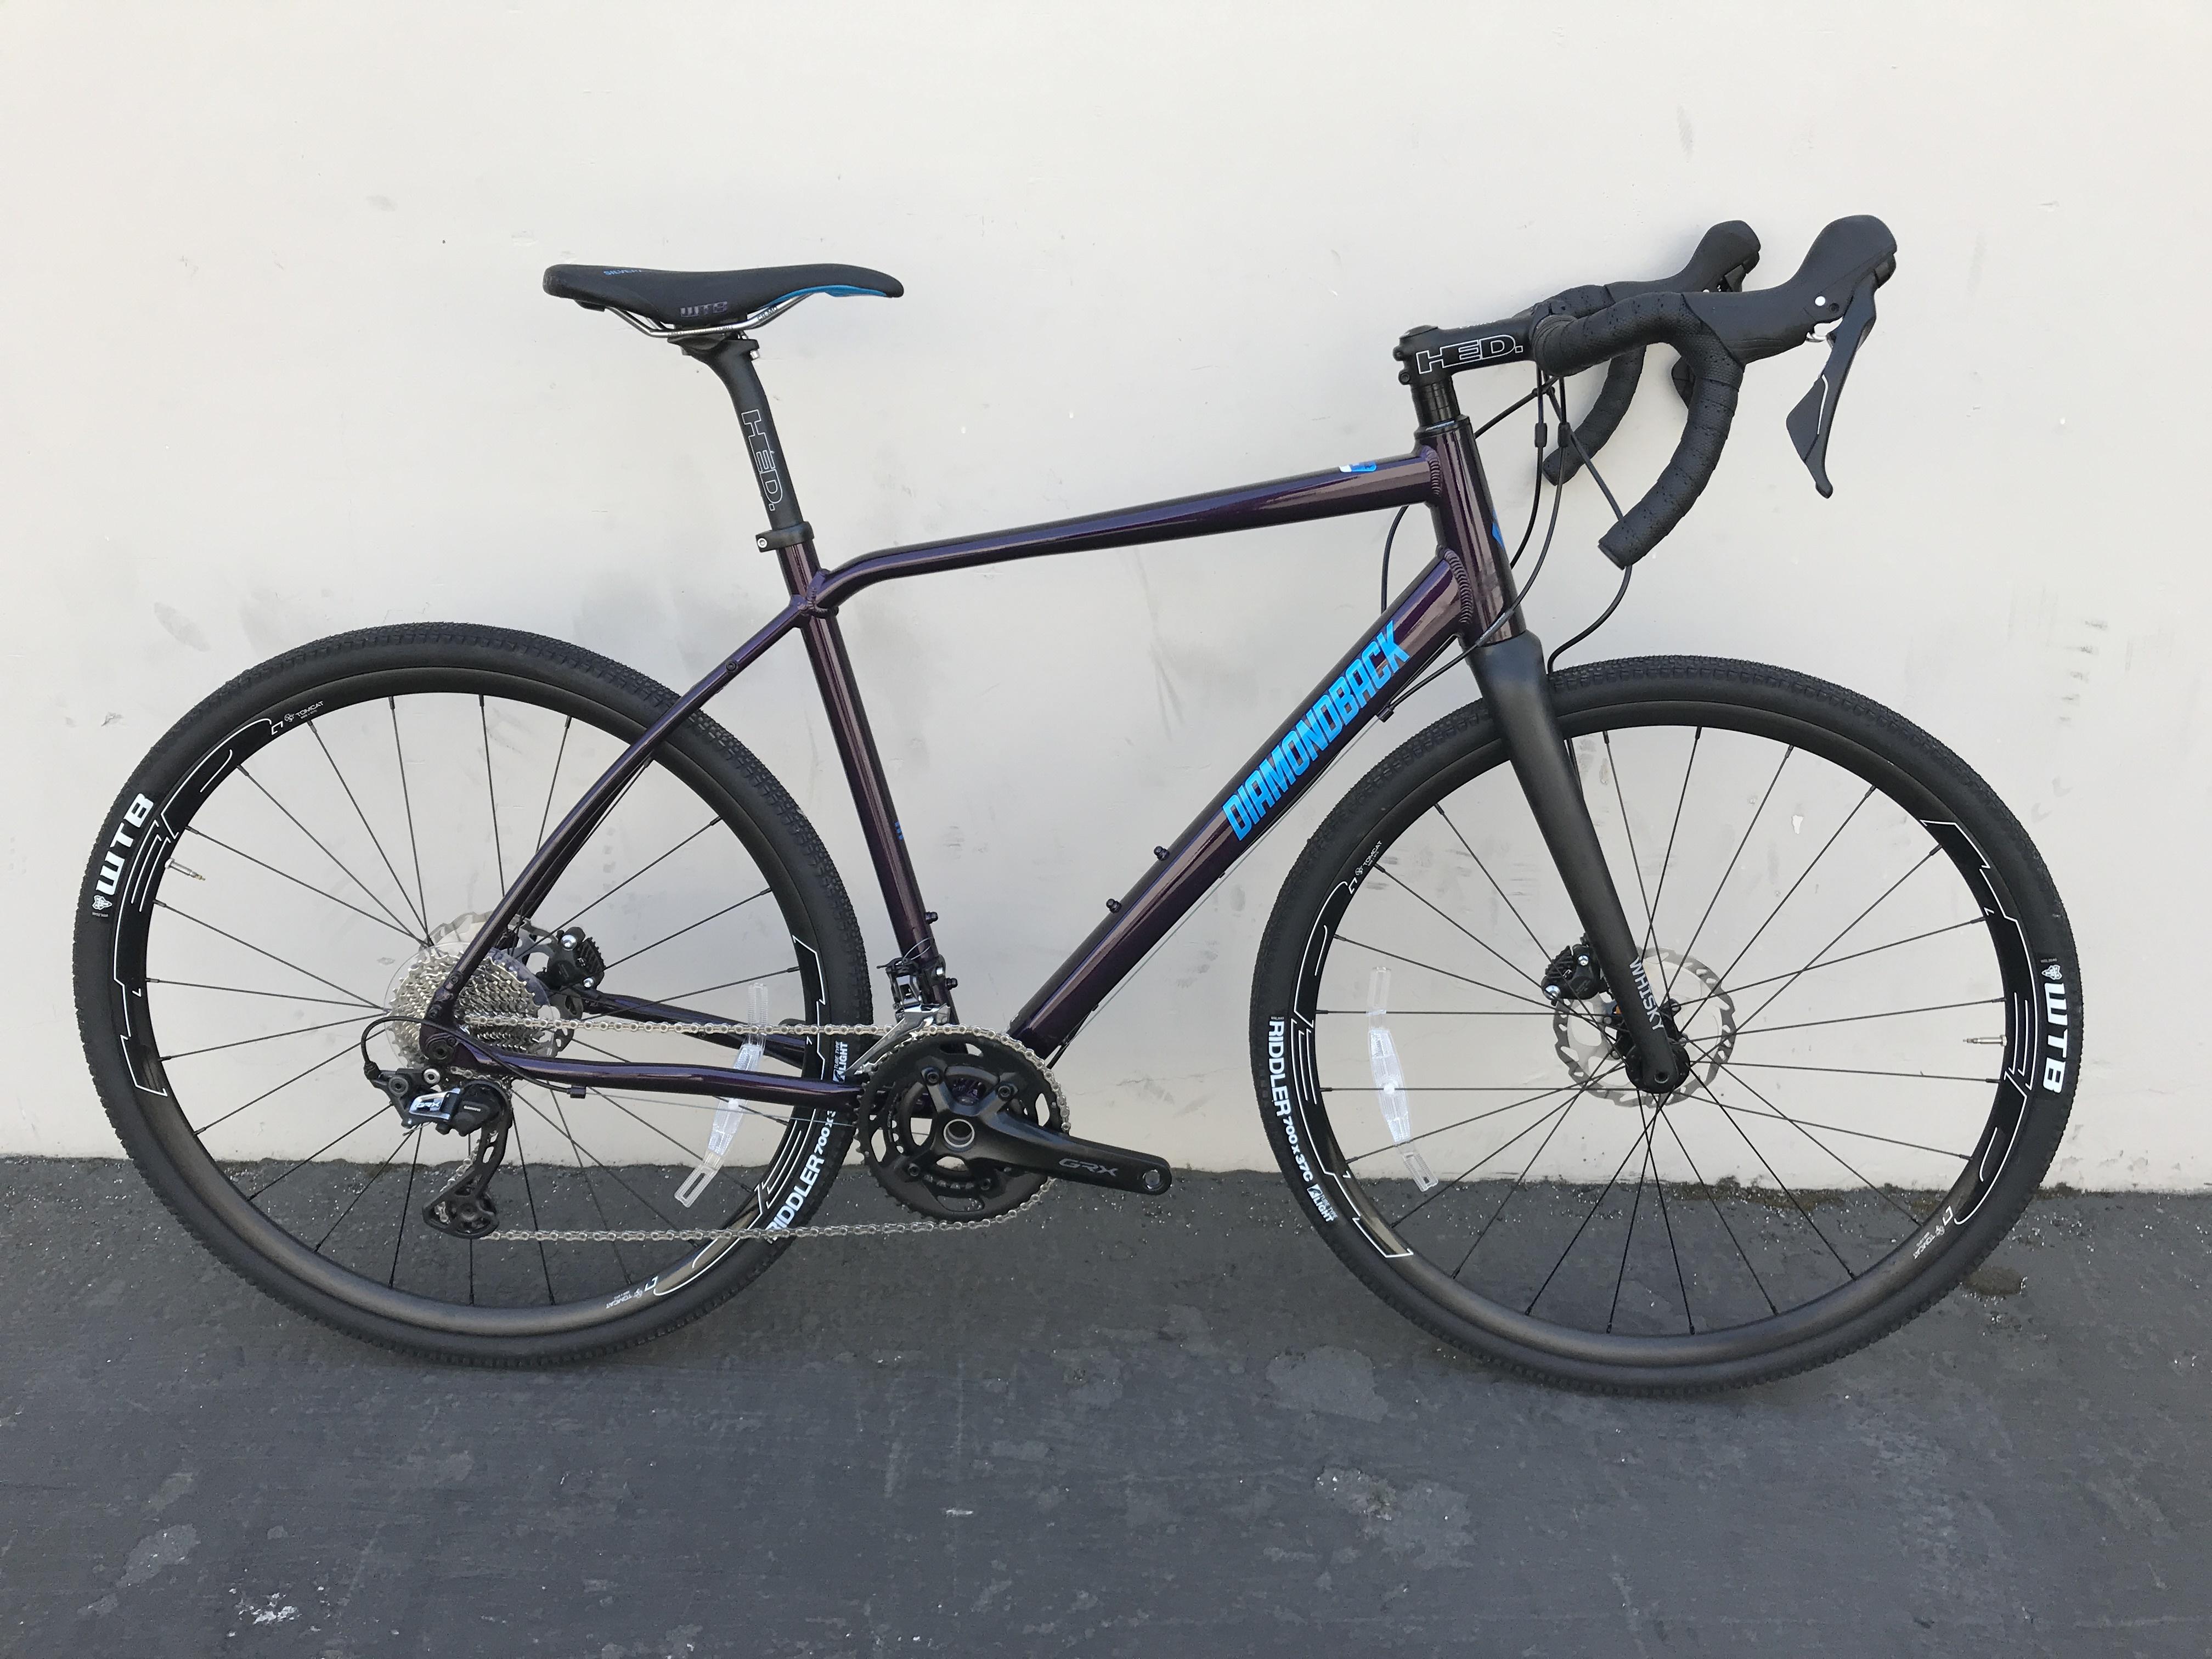 CHRISSON MTB Trekking Bike Front HR 27.5 650B Disc Aero Wheel Black